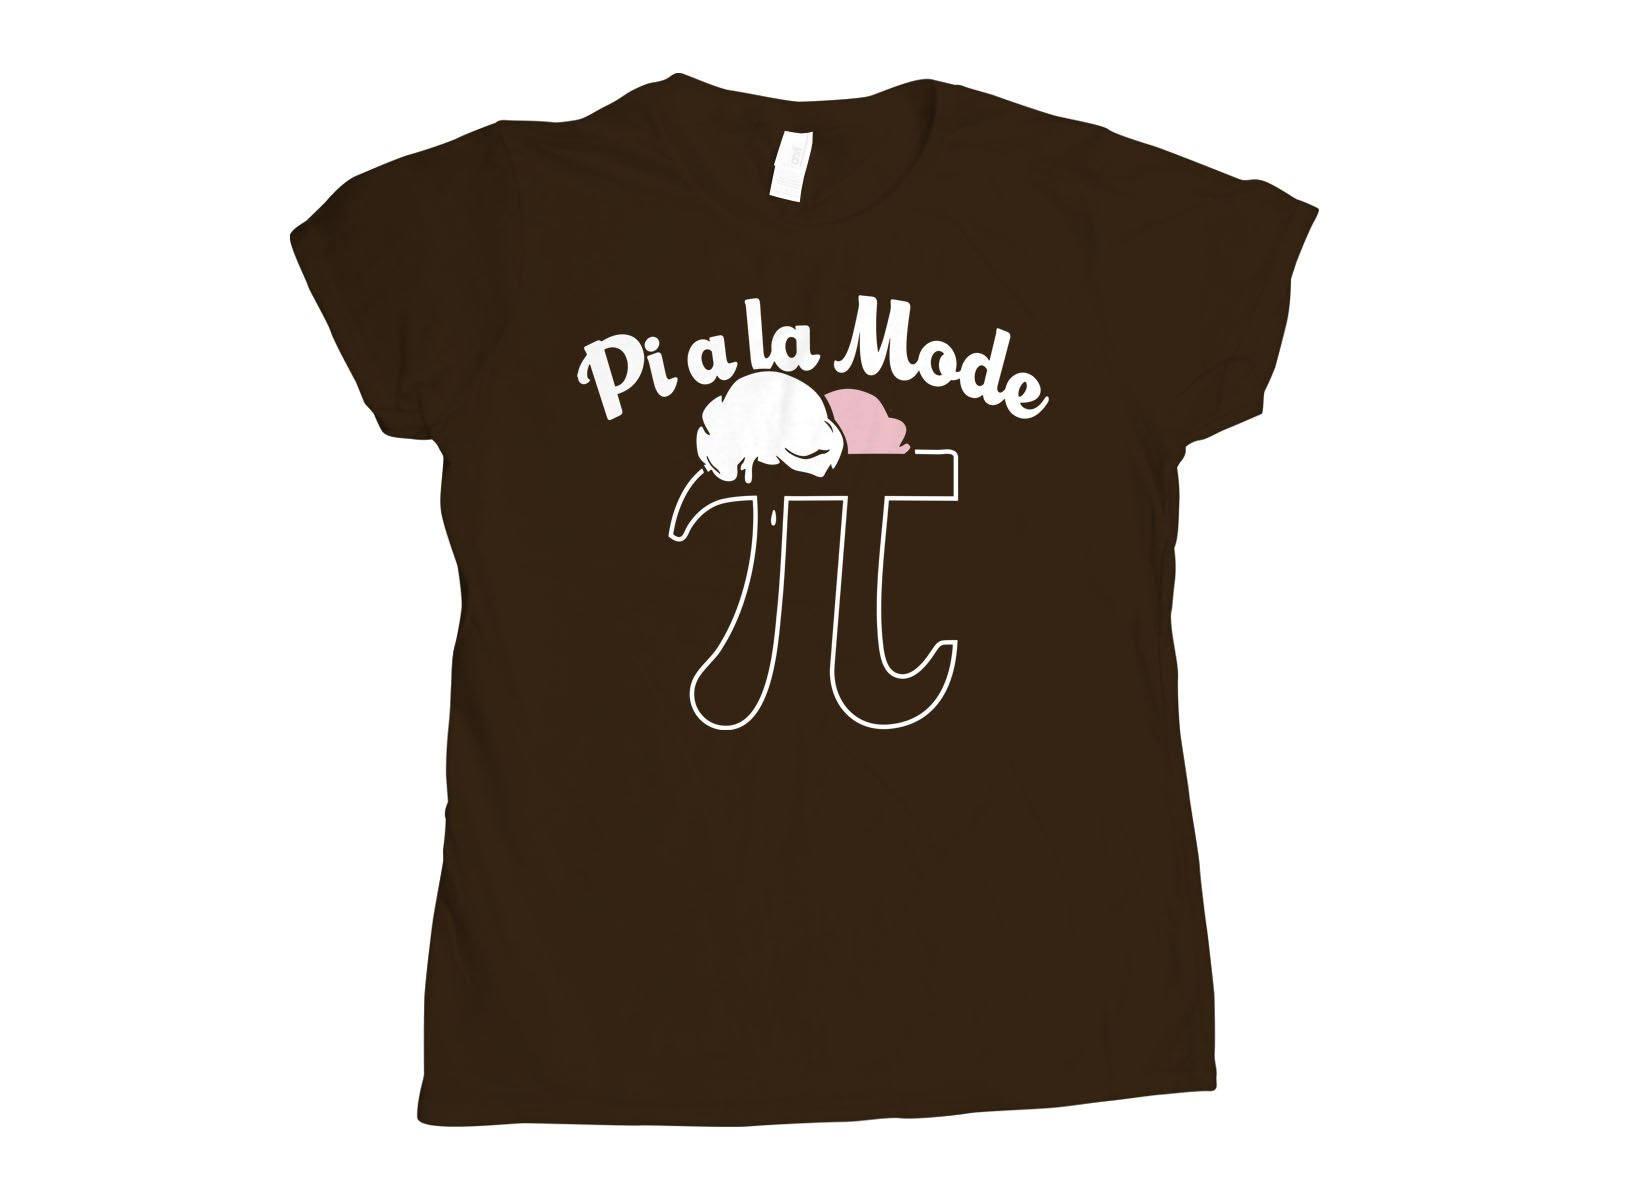 Pi a la Mode on Womens T-Shirt